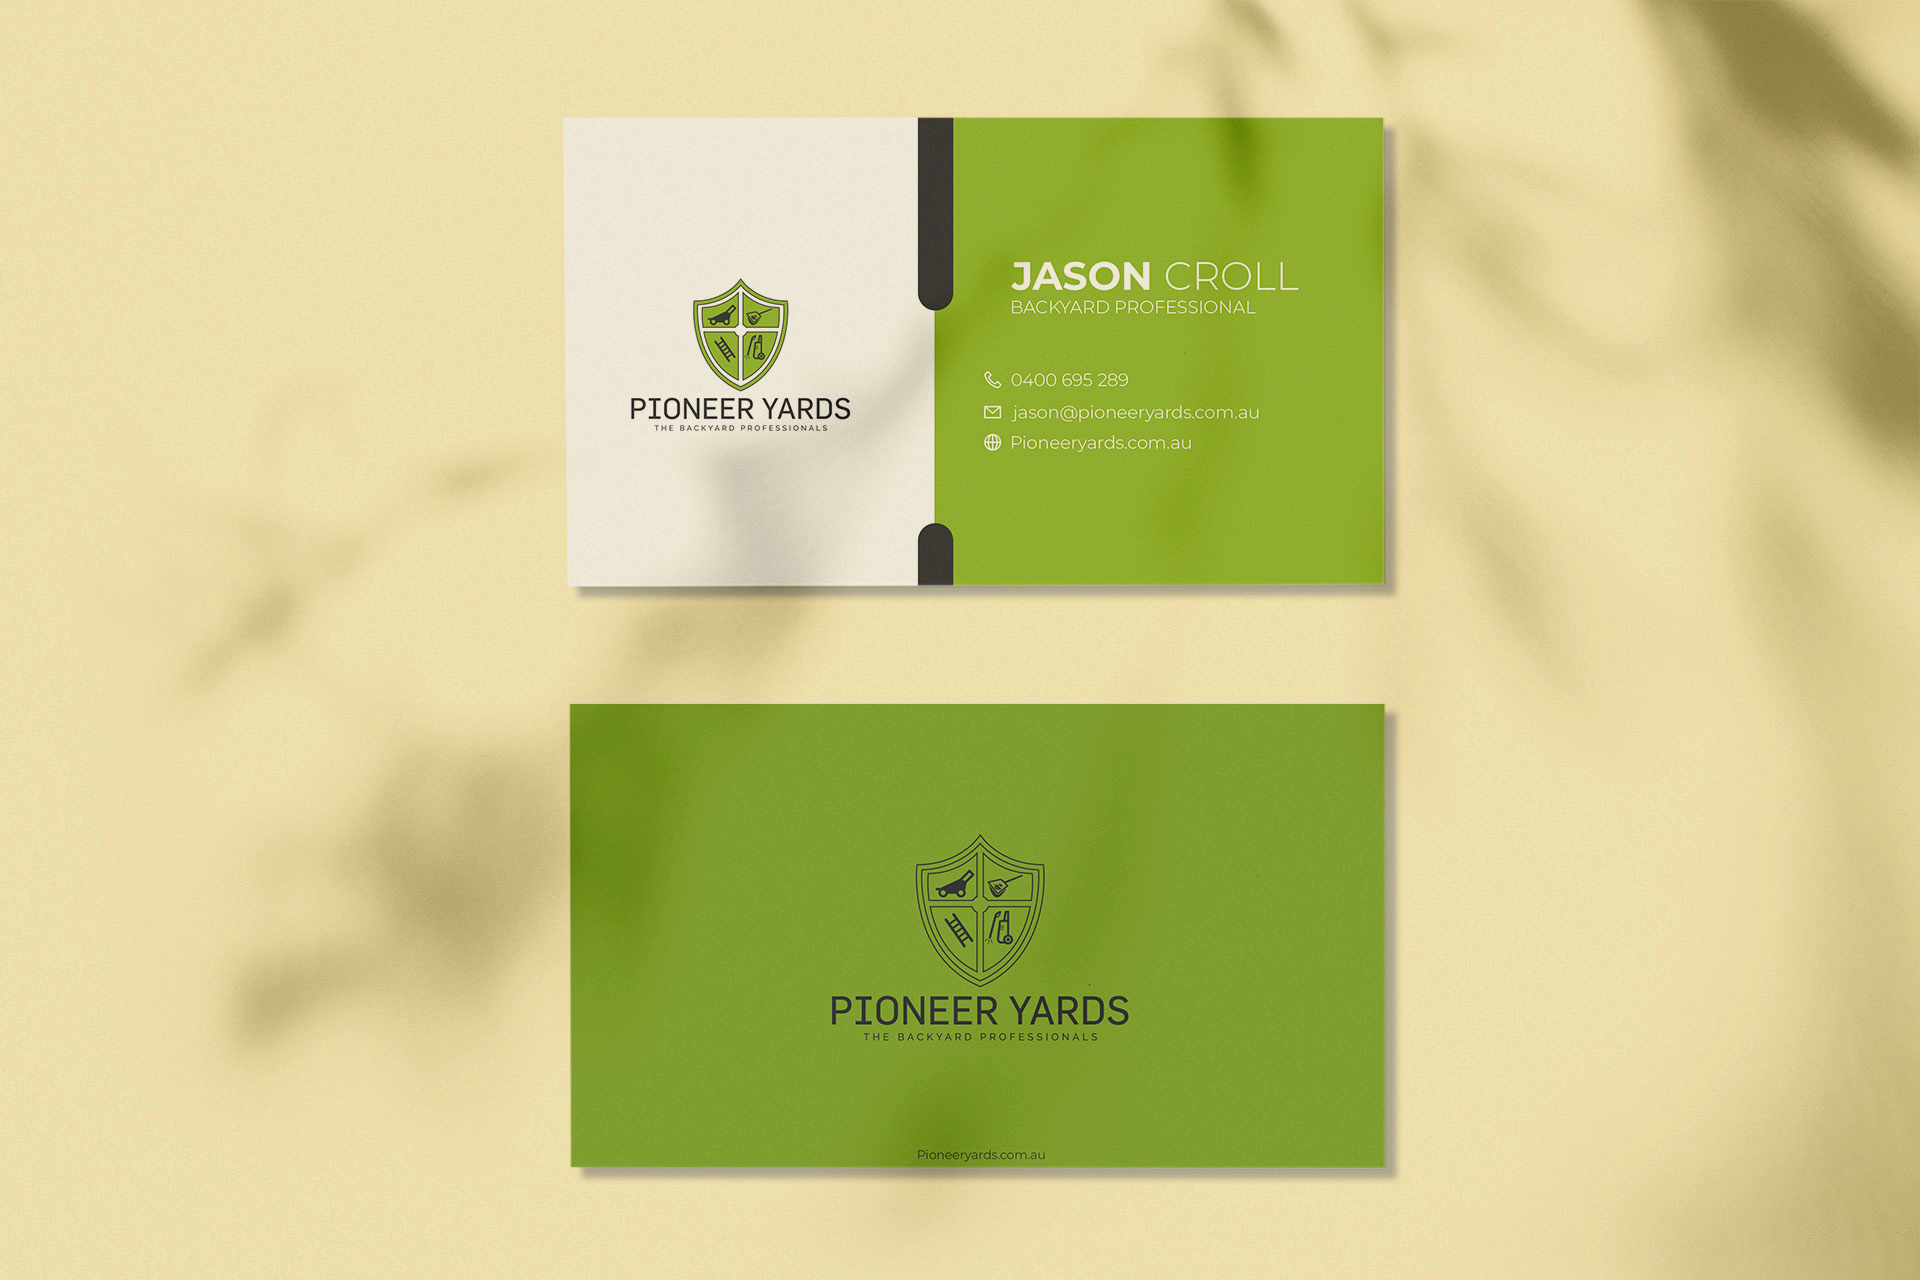 Pioneer Yards business card mockup design ideas| Green| Black| White | Gardening tools Logo| Custom| Get Solutions